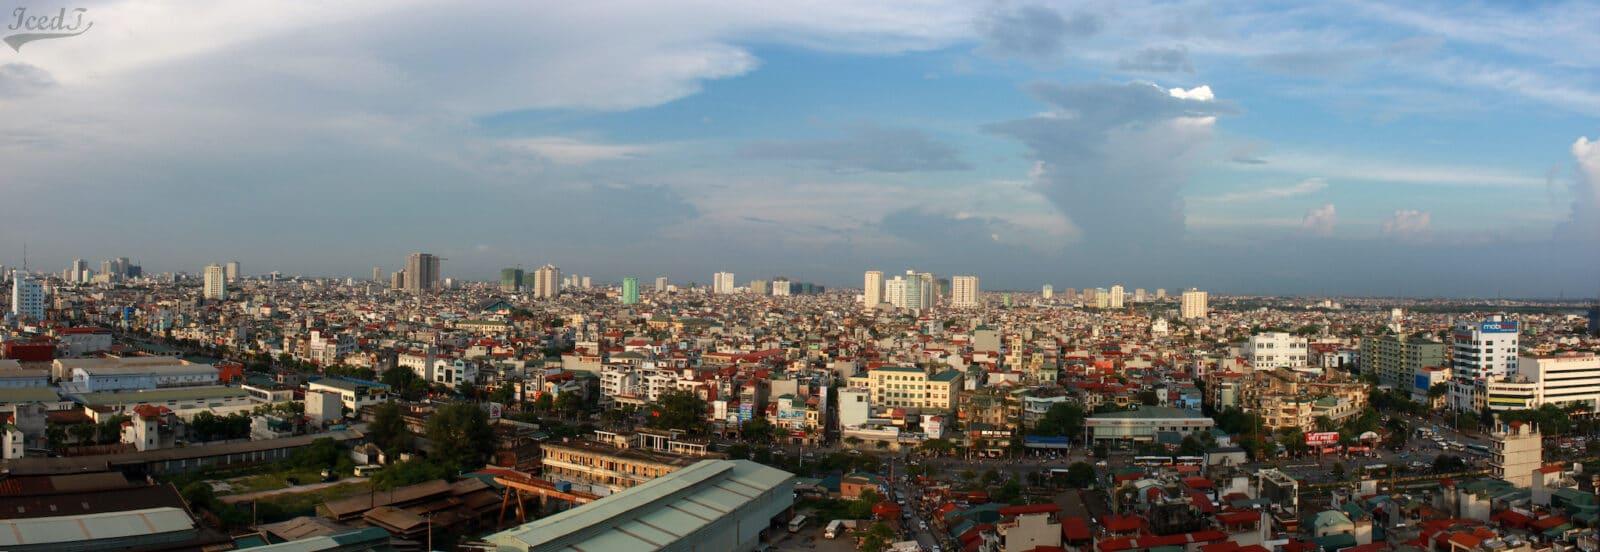 Hanoi Vietnam City Skyline Daytime